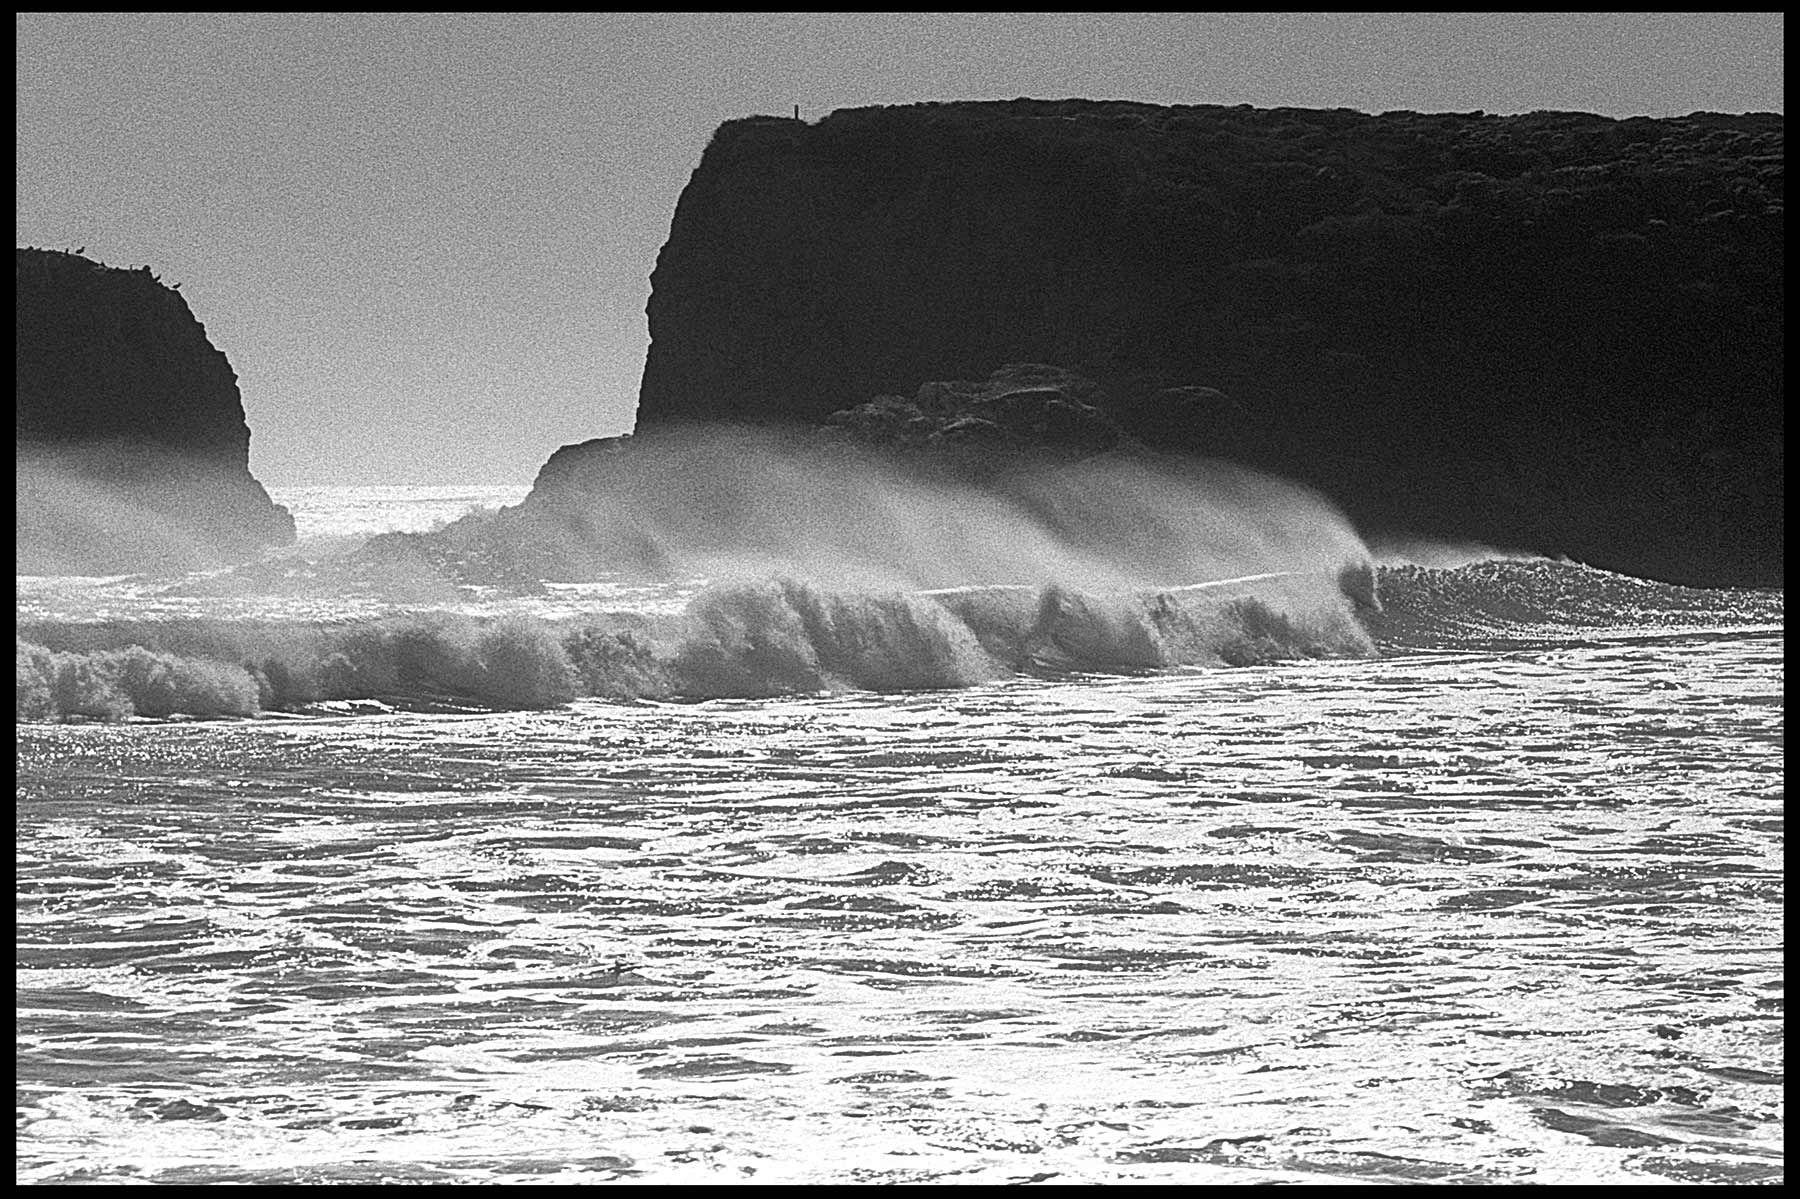 Andrew Molera Beach, windblown surf, pacific ocean, b&w, film, Stephen Collector